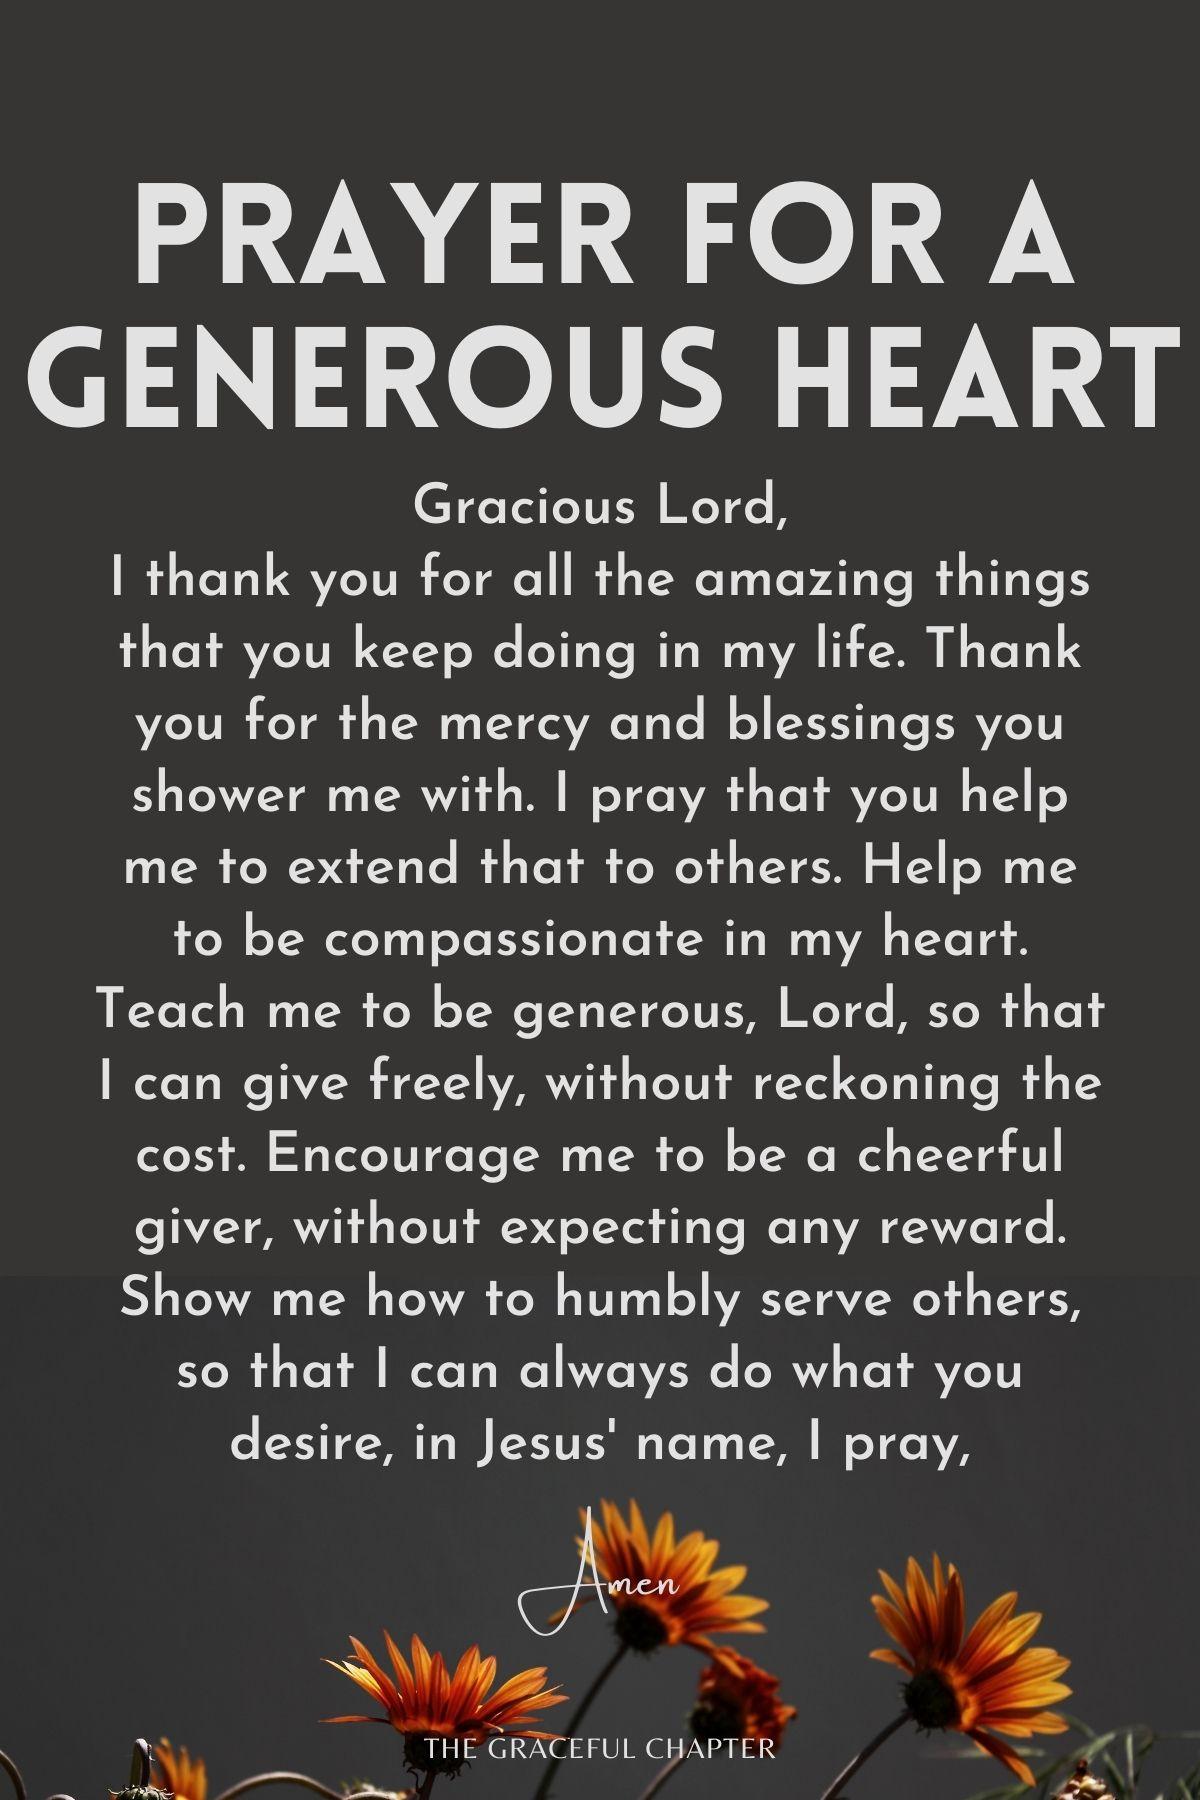 Prayer for a generous heart